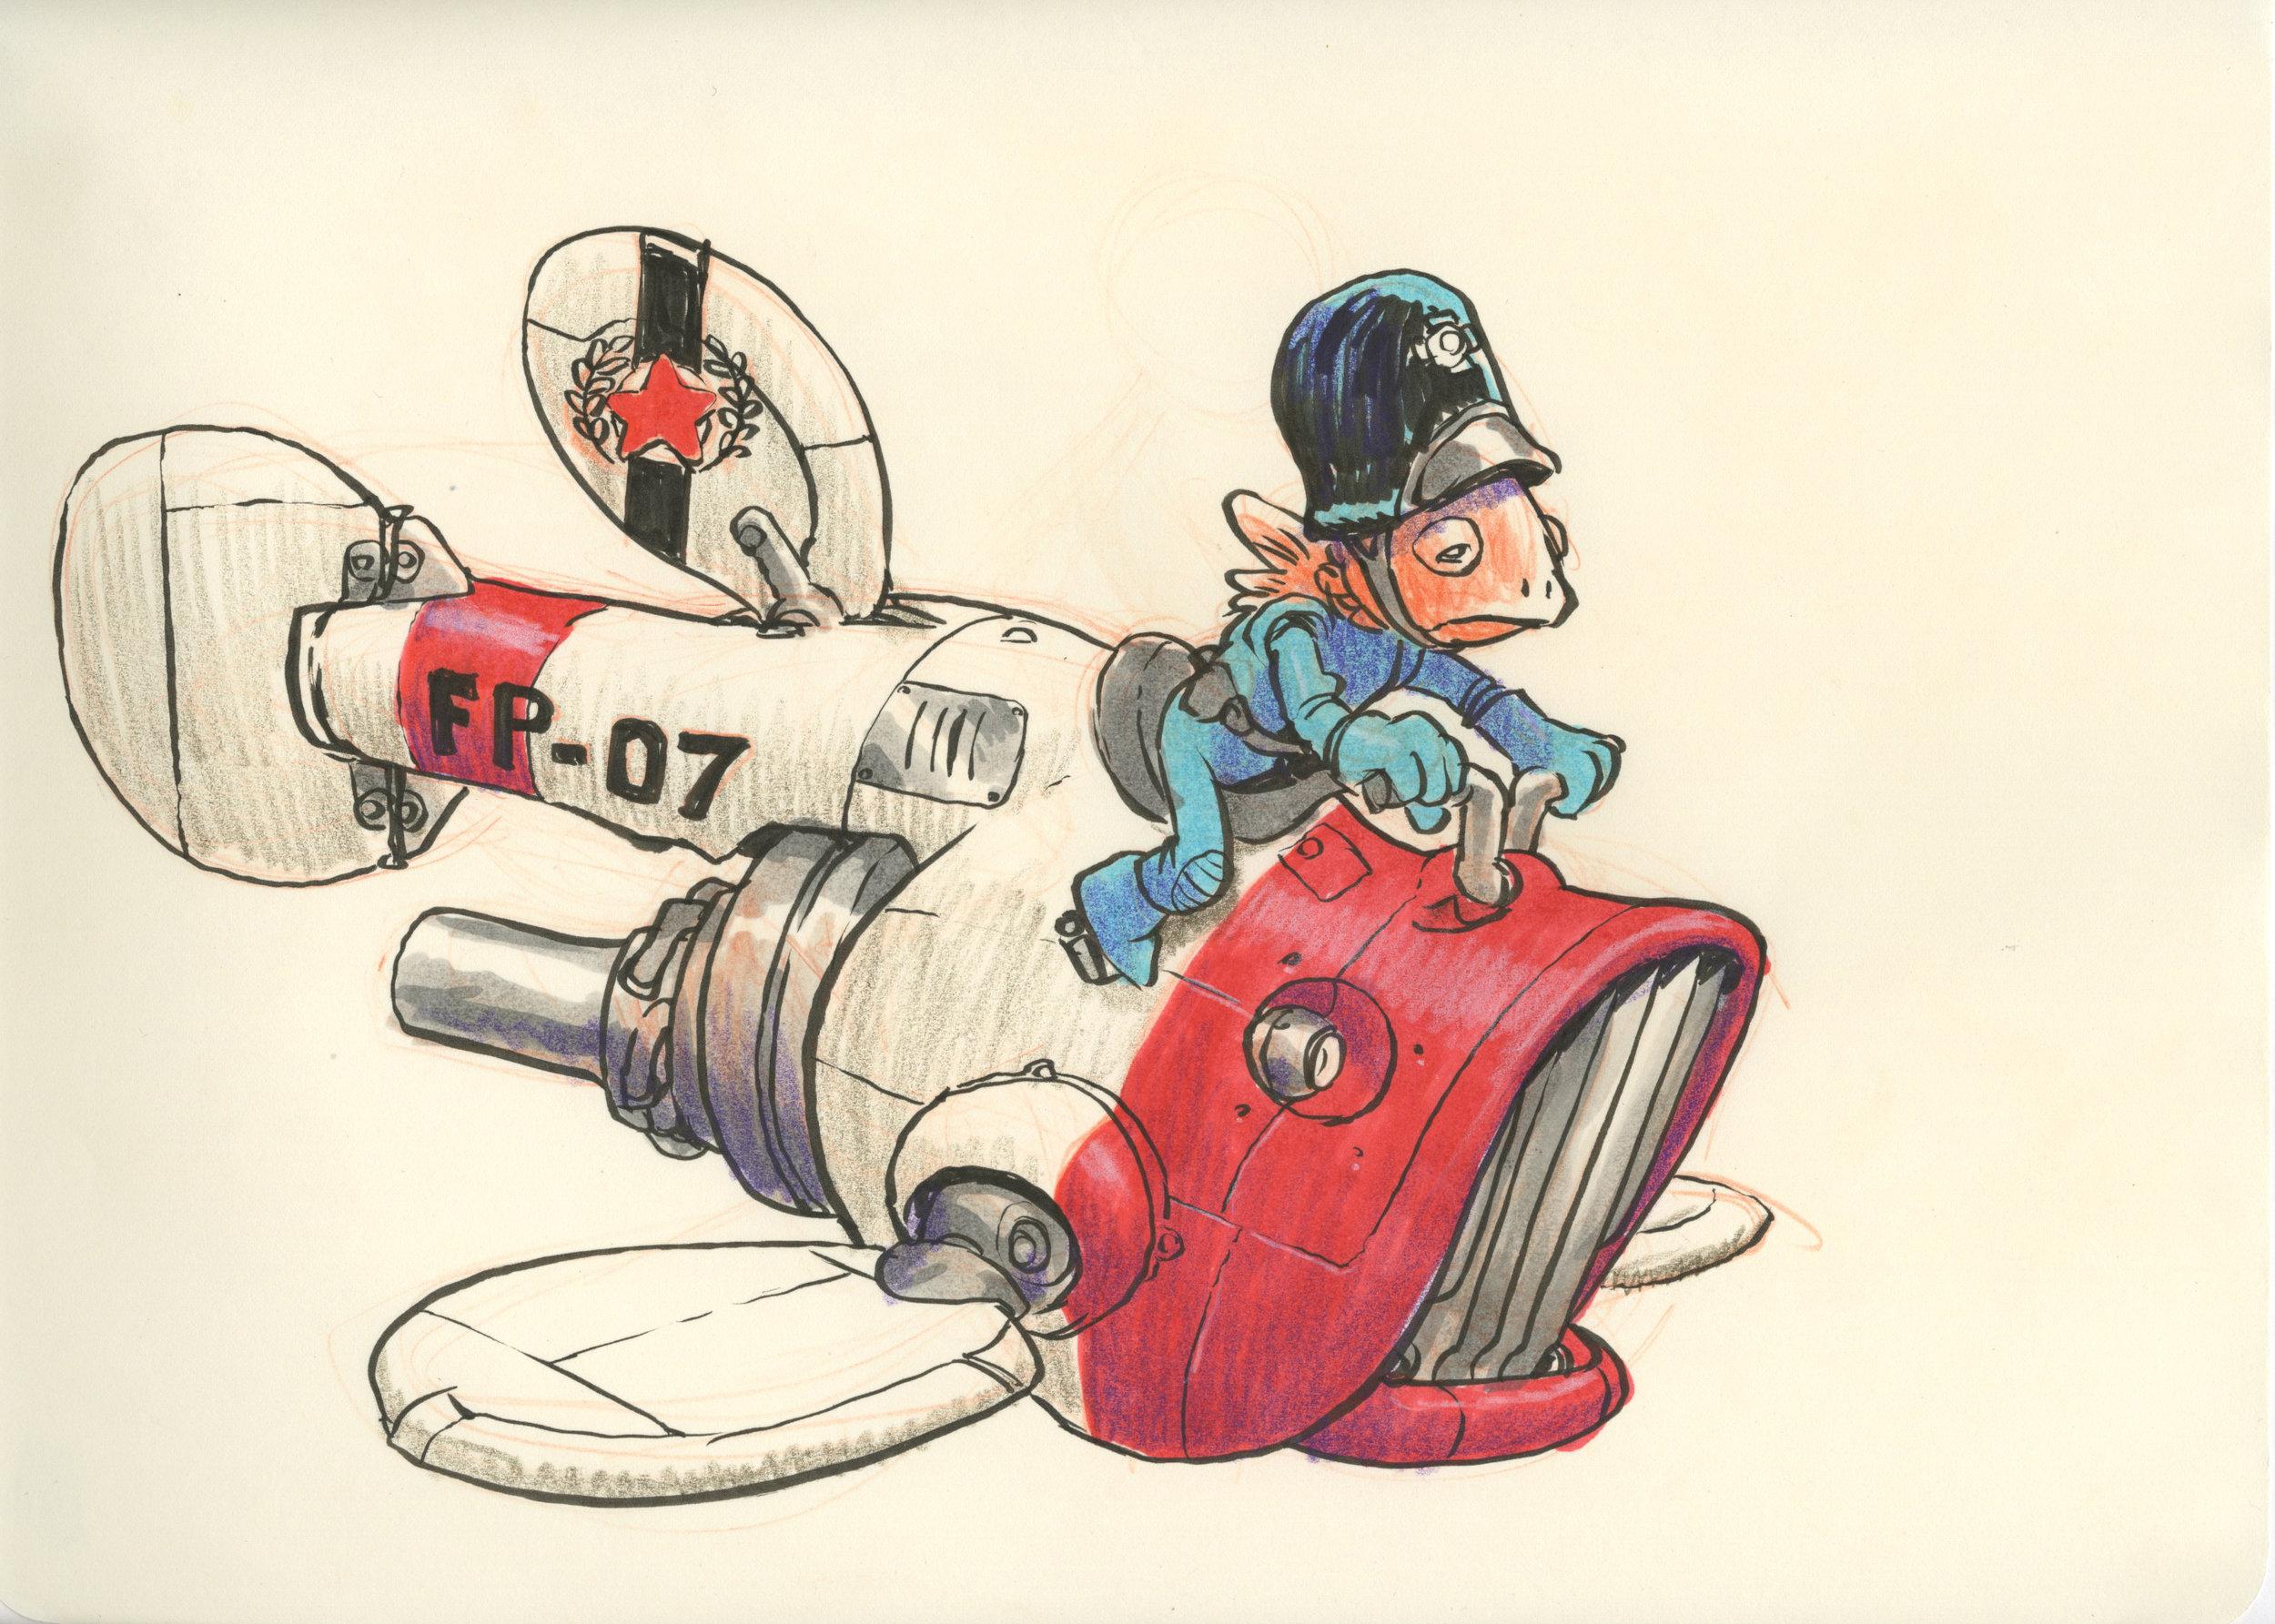 Calling all cars! Illustration by Jake Parker.